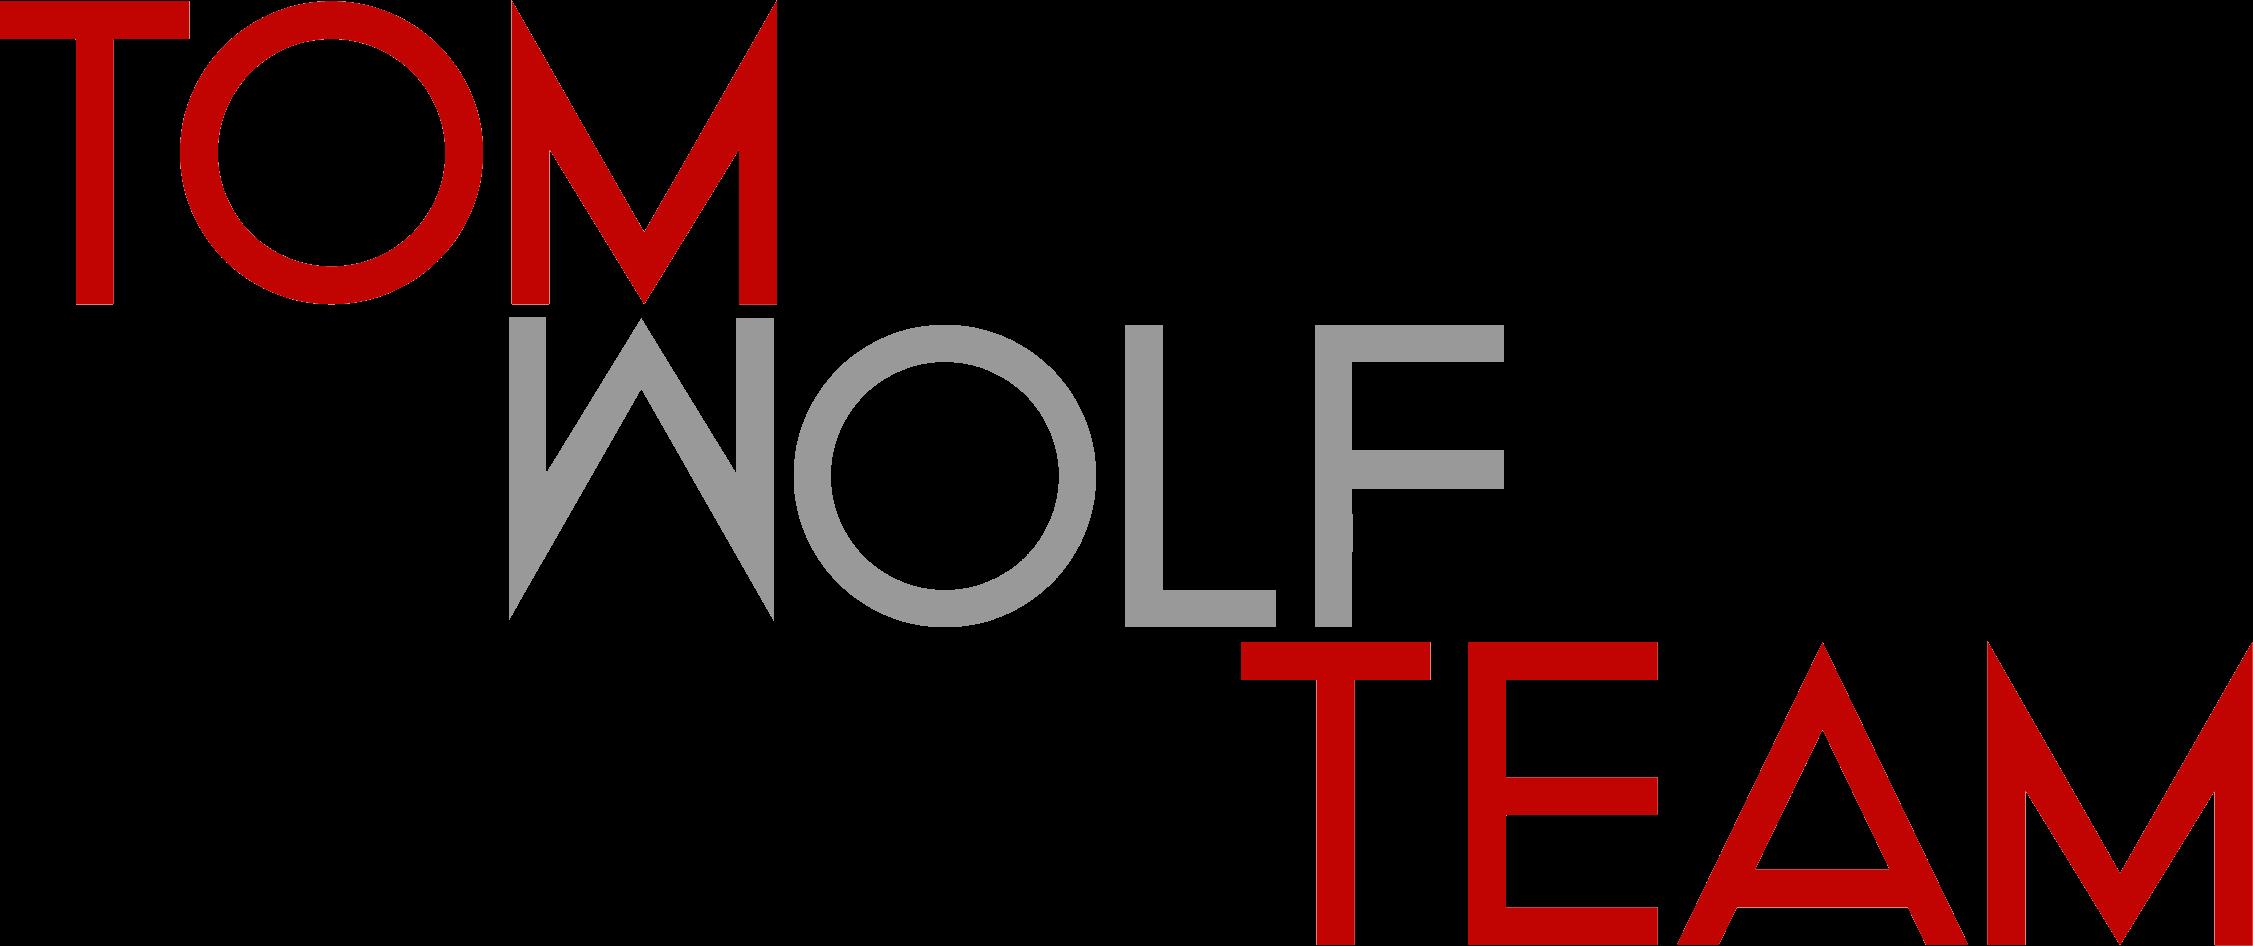 Tom Wolf Team